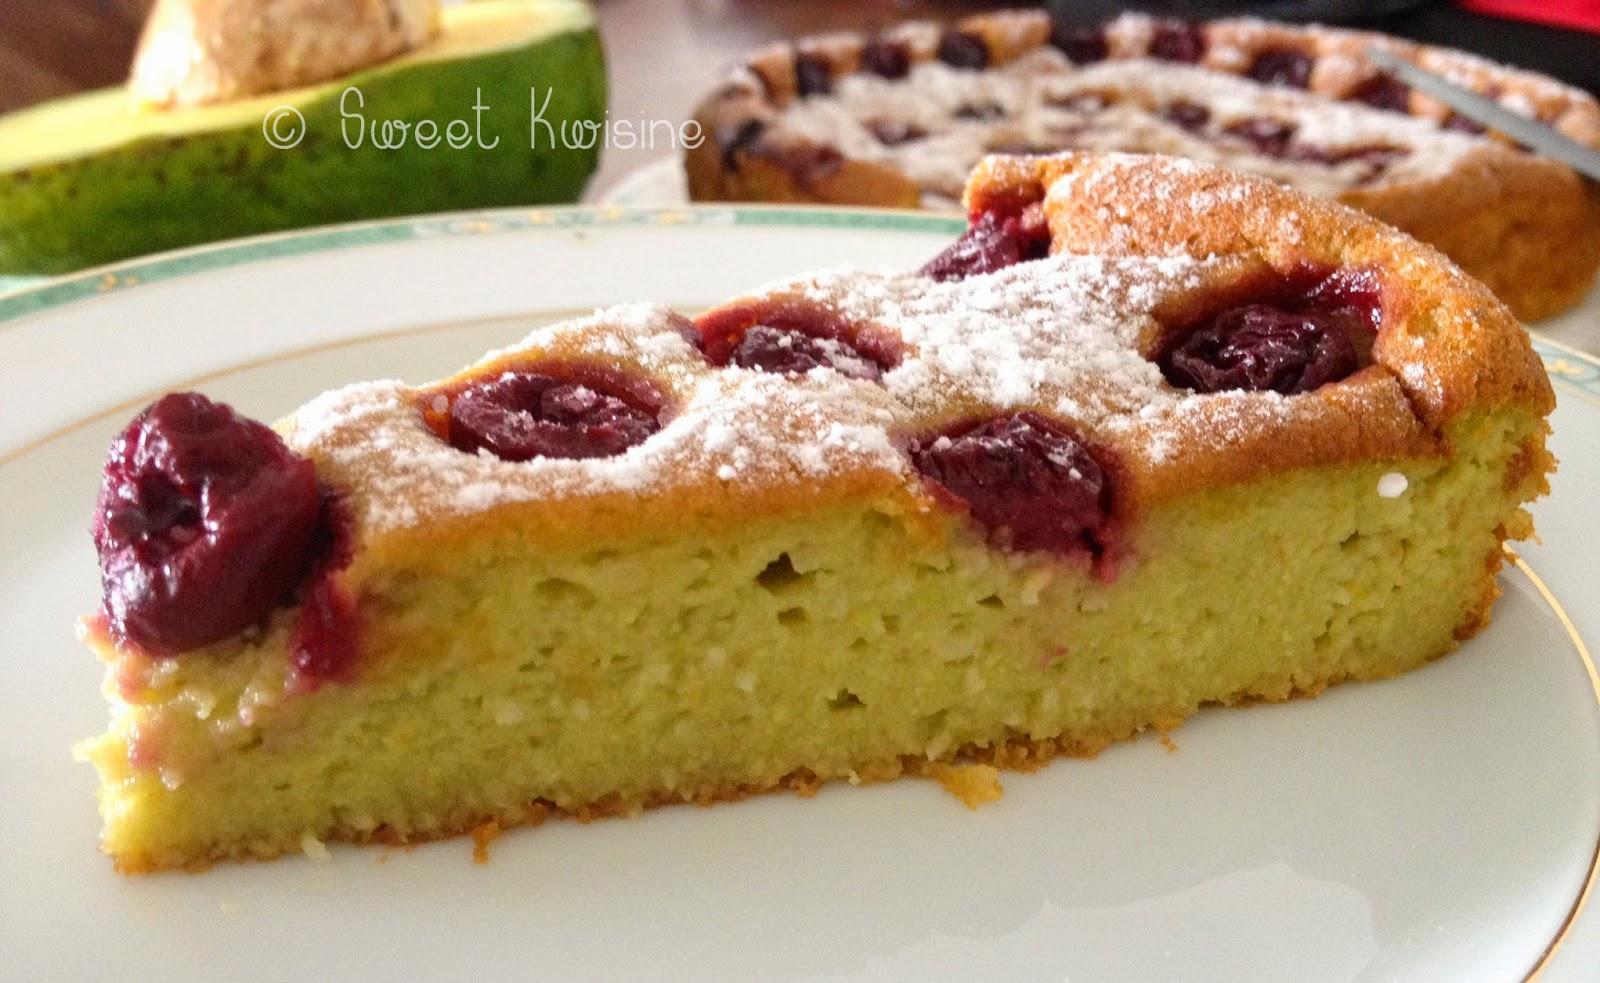 Sweet Kwisine, gâteau, avocat, avocado, cake, healthy food, cuisine légère, Brésil, cuisine végétarienne